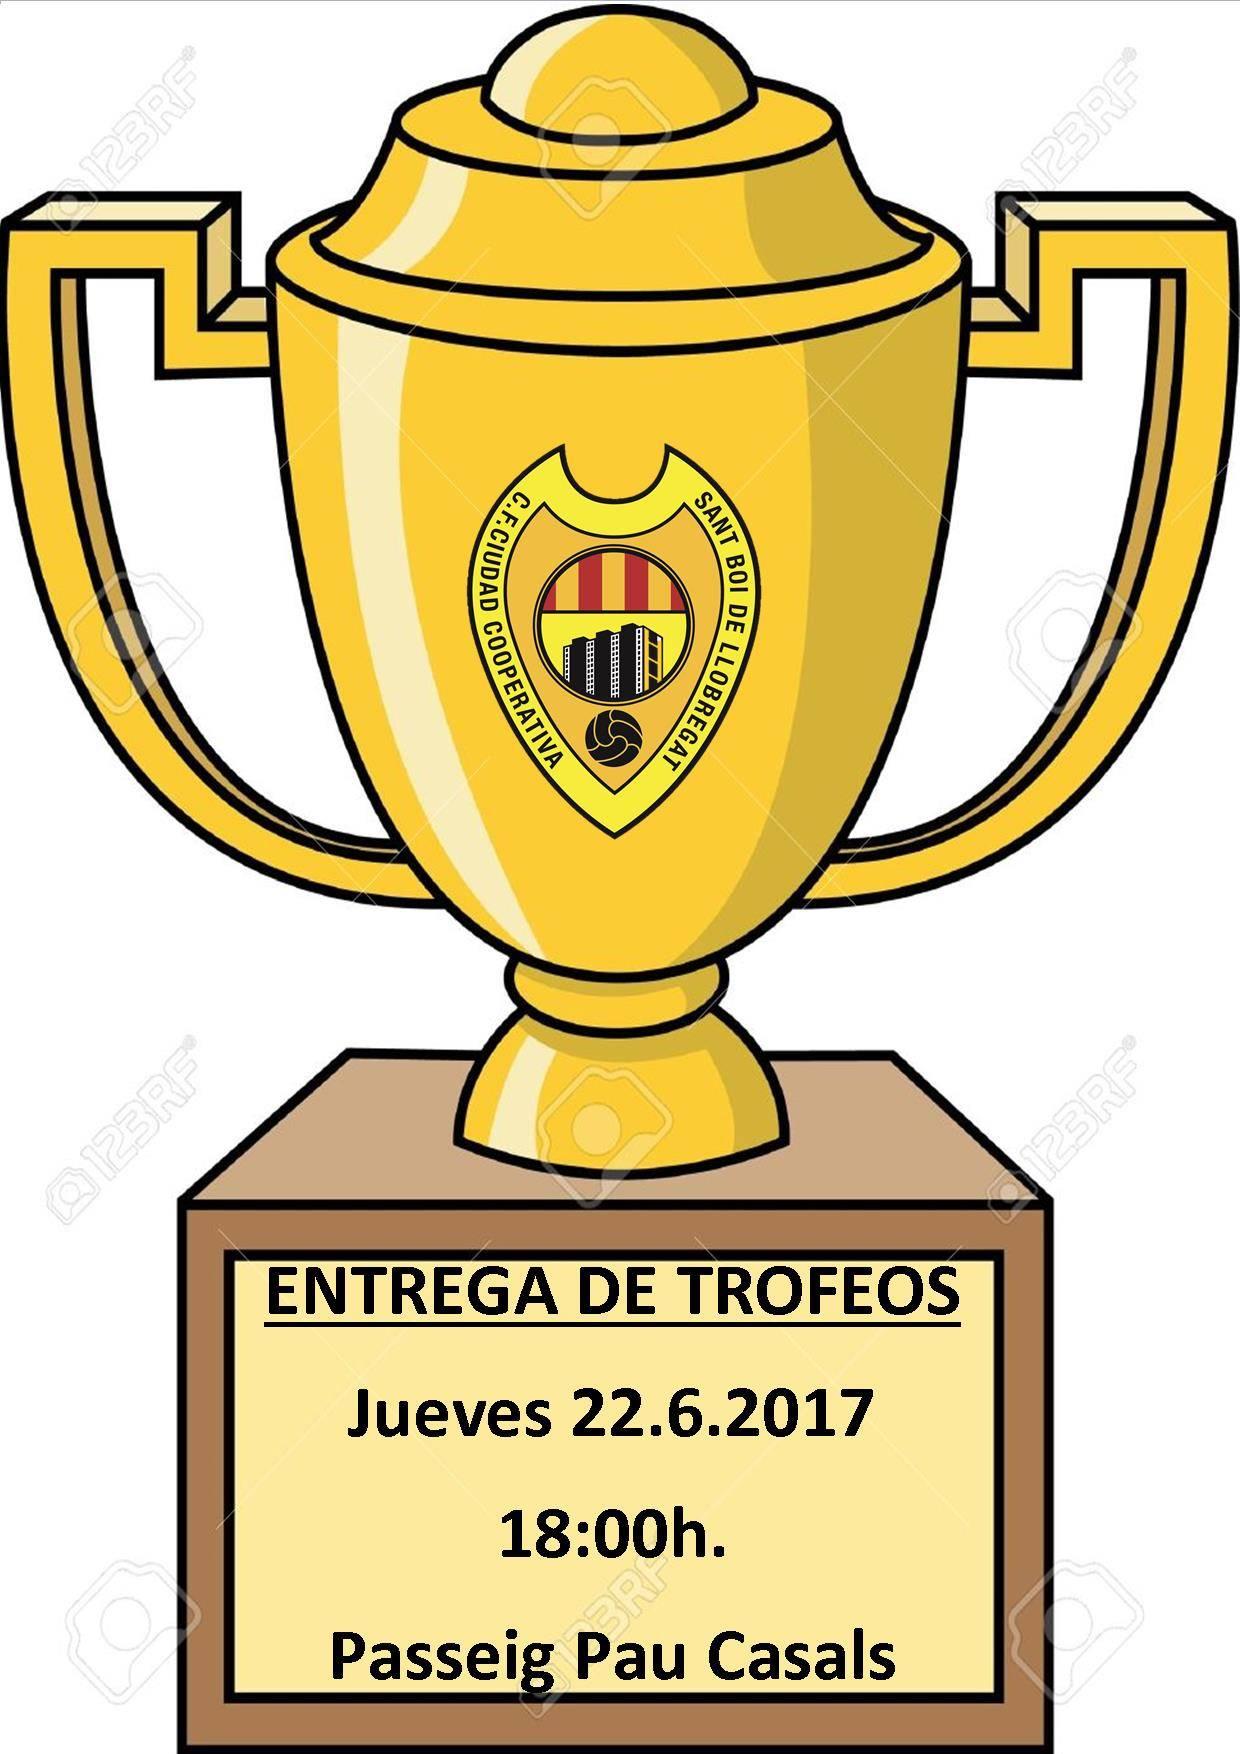 trofeos 17.jpg